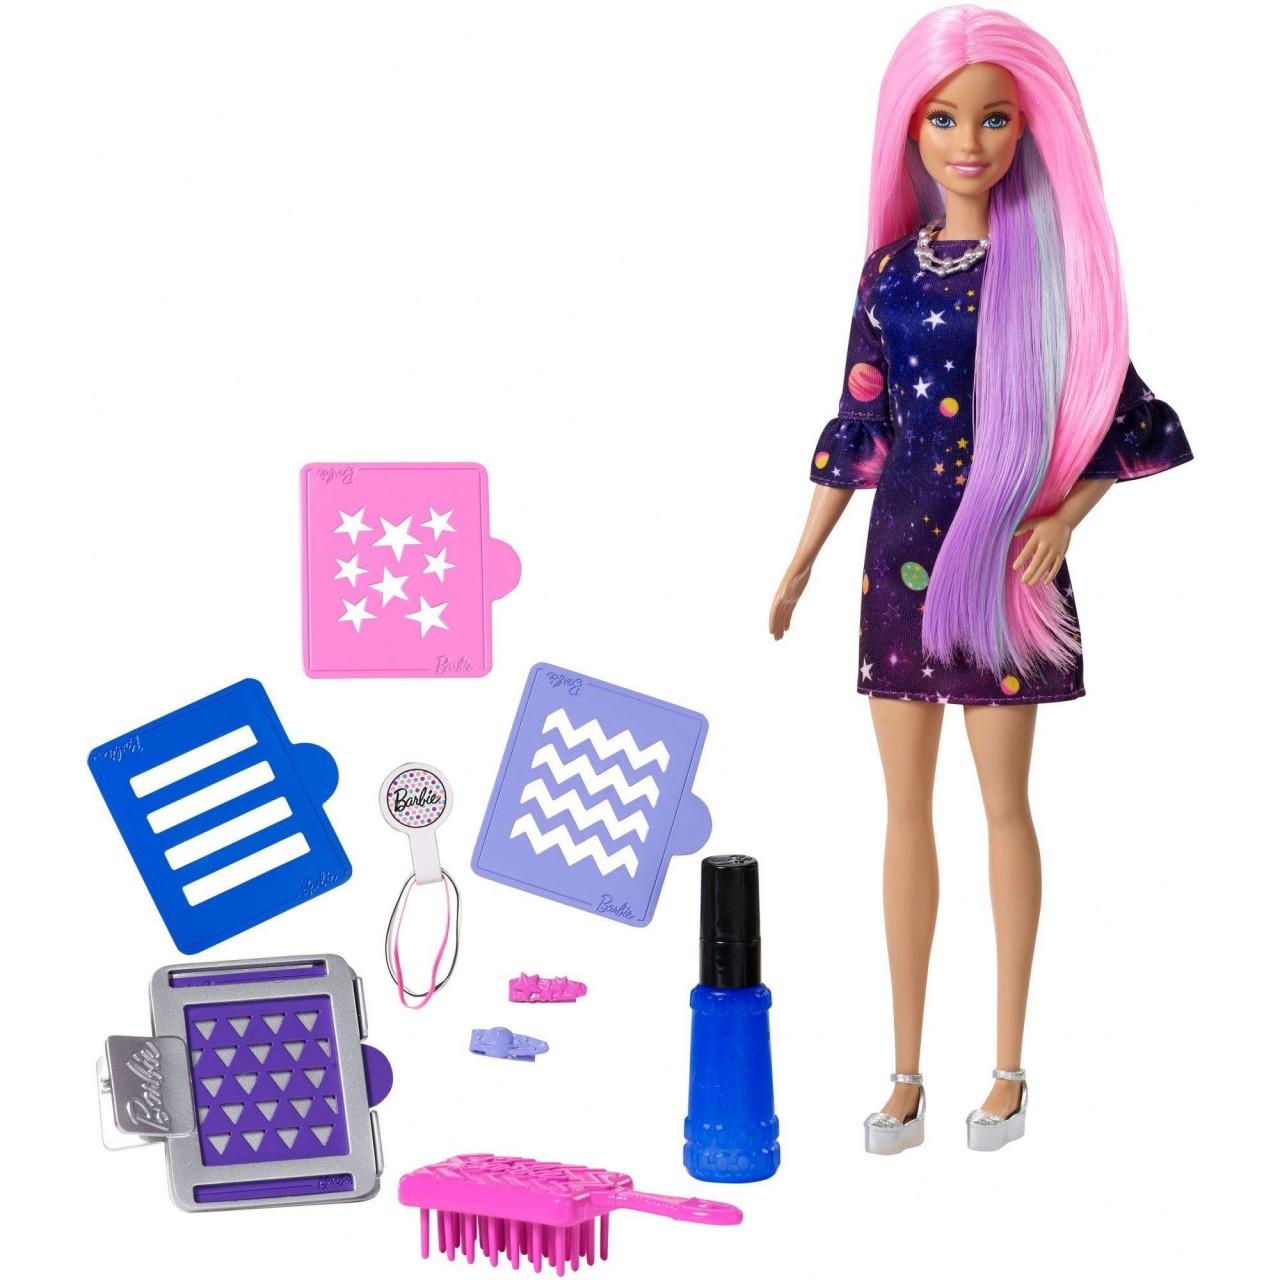 Кукла Barbie Цветной Сюрприз (FHX00) Barbie Color Surprise